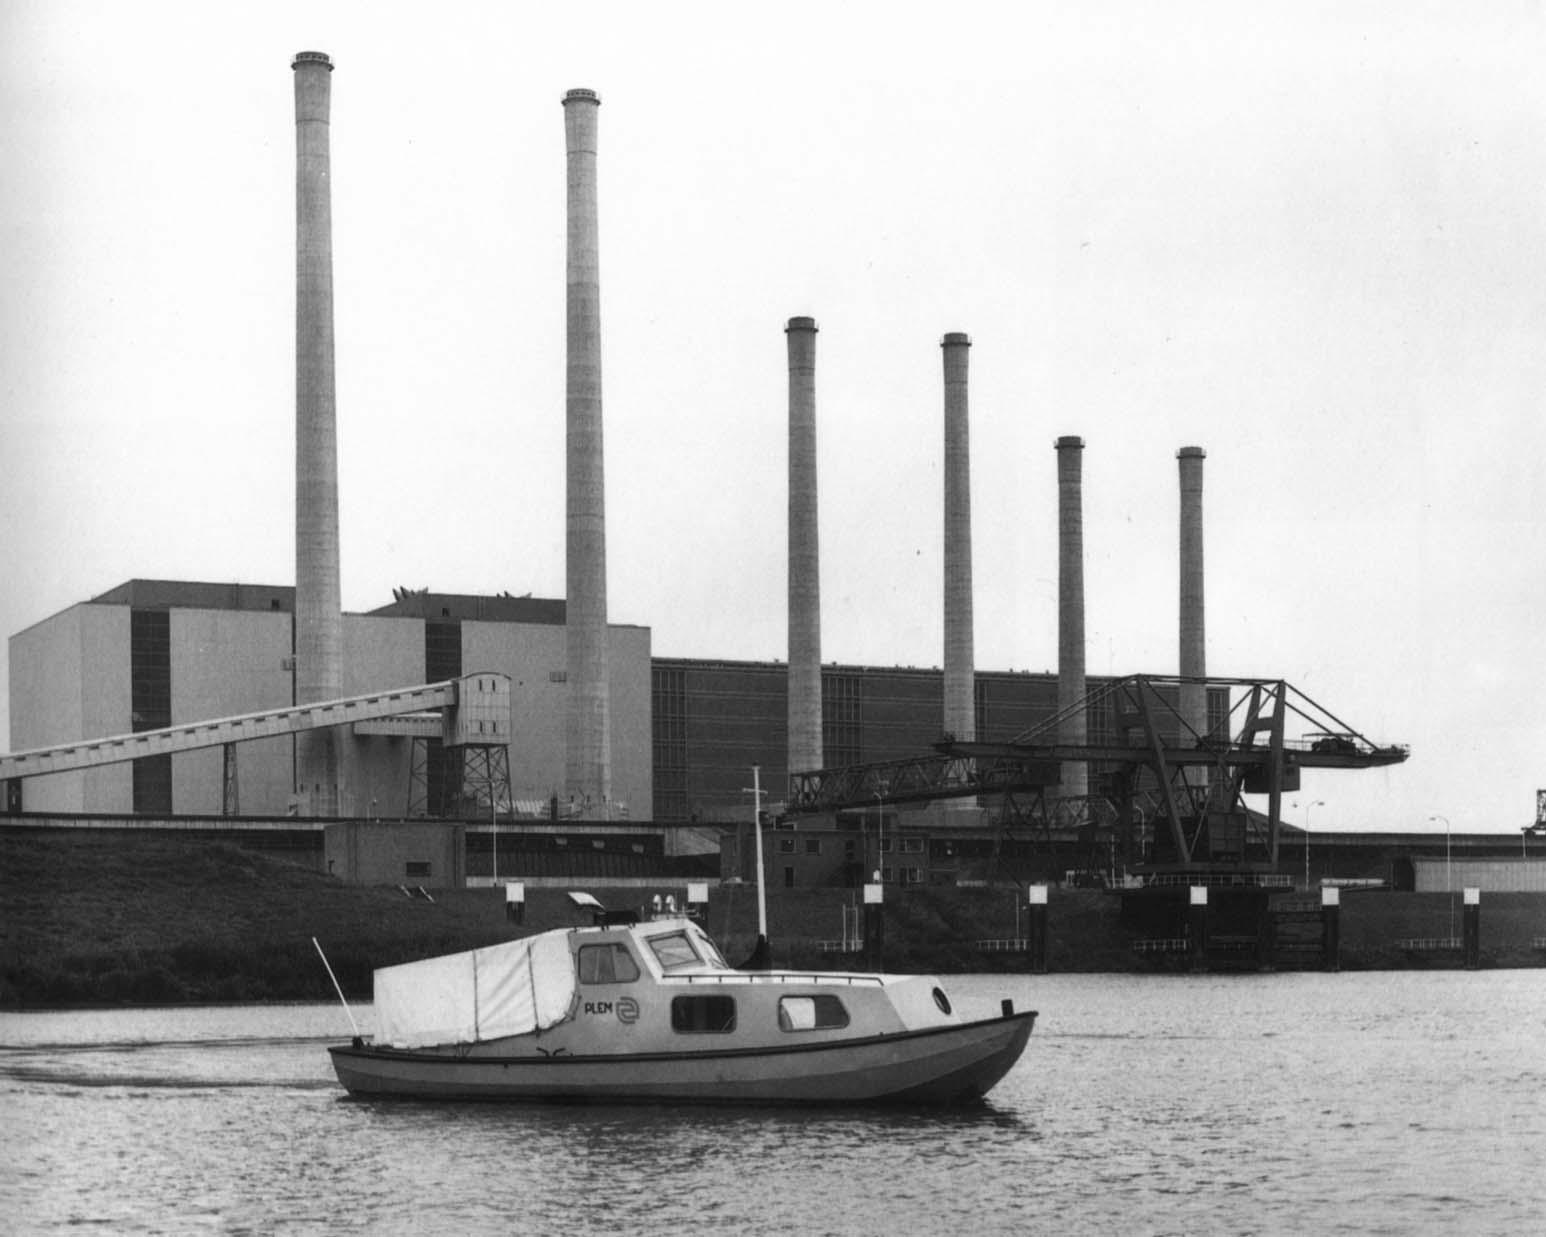 Plem-boot-1972-bij-de-maascentrale